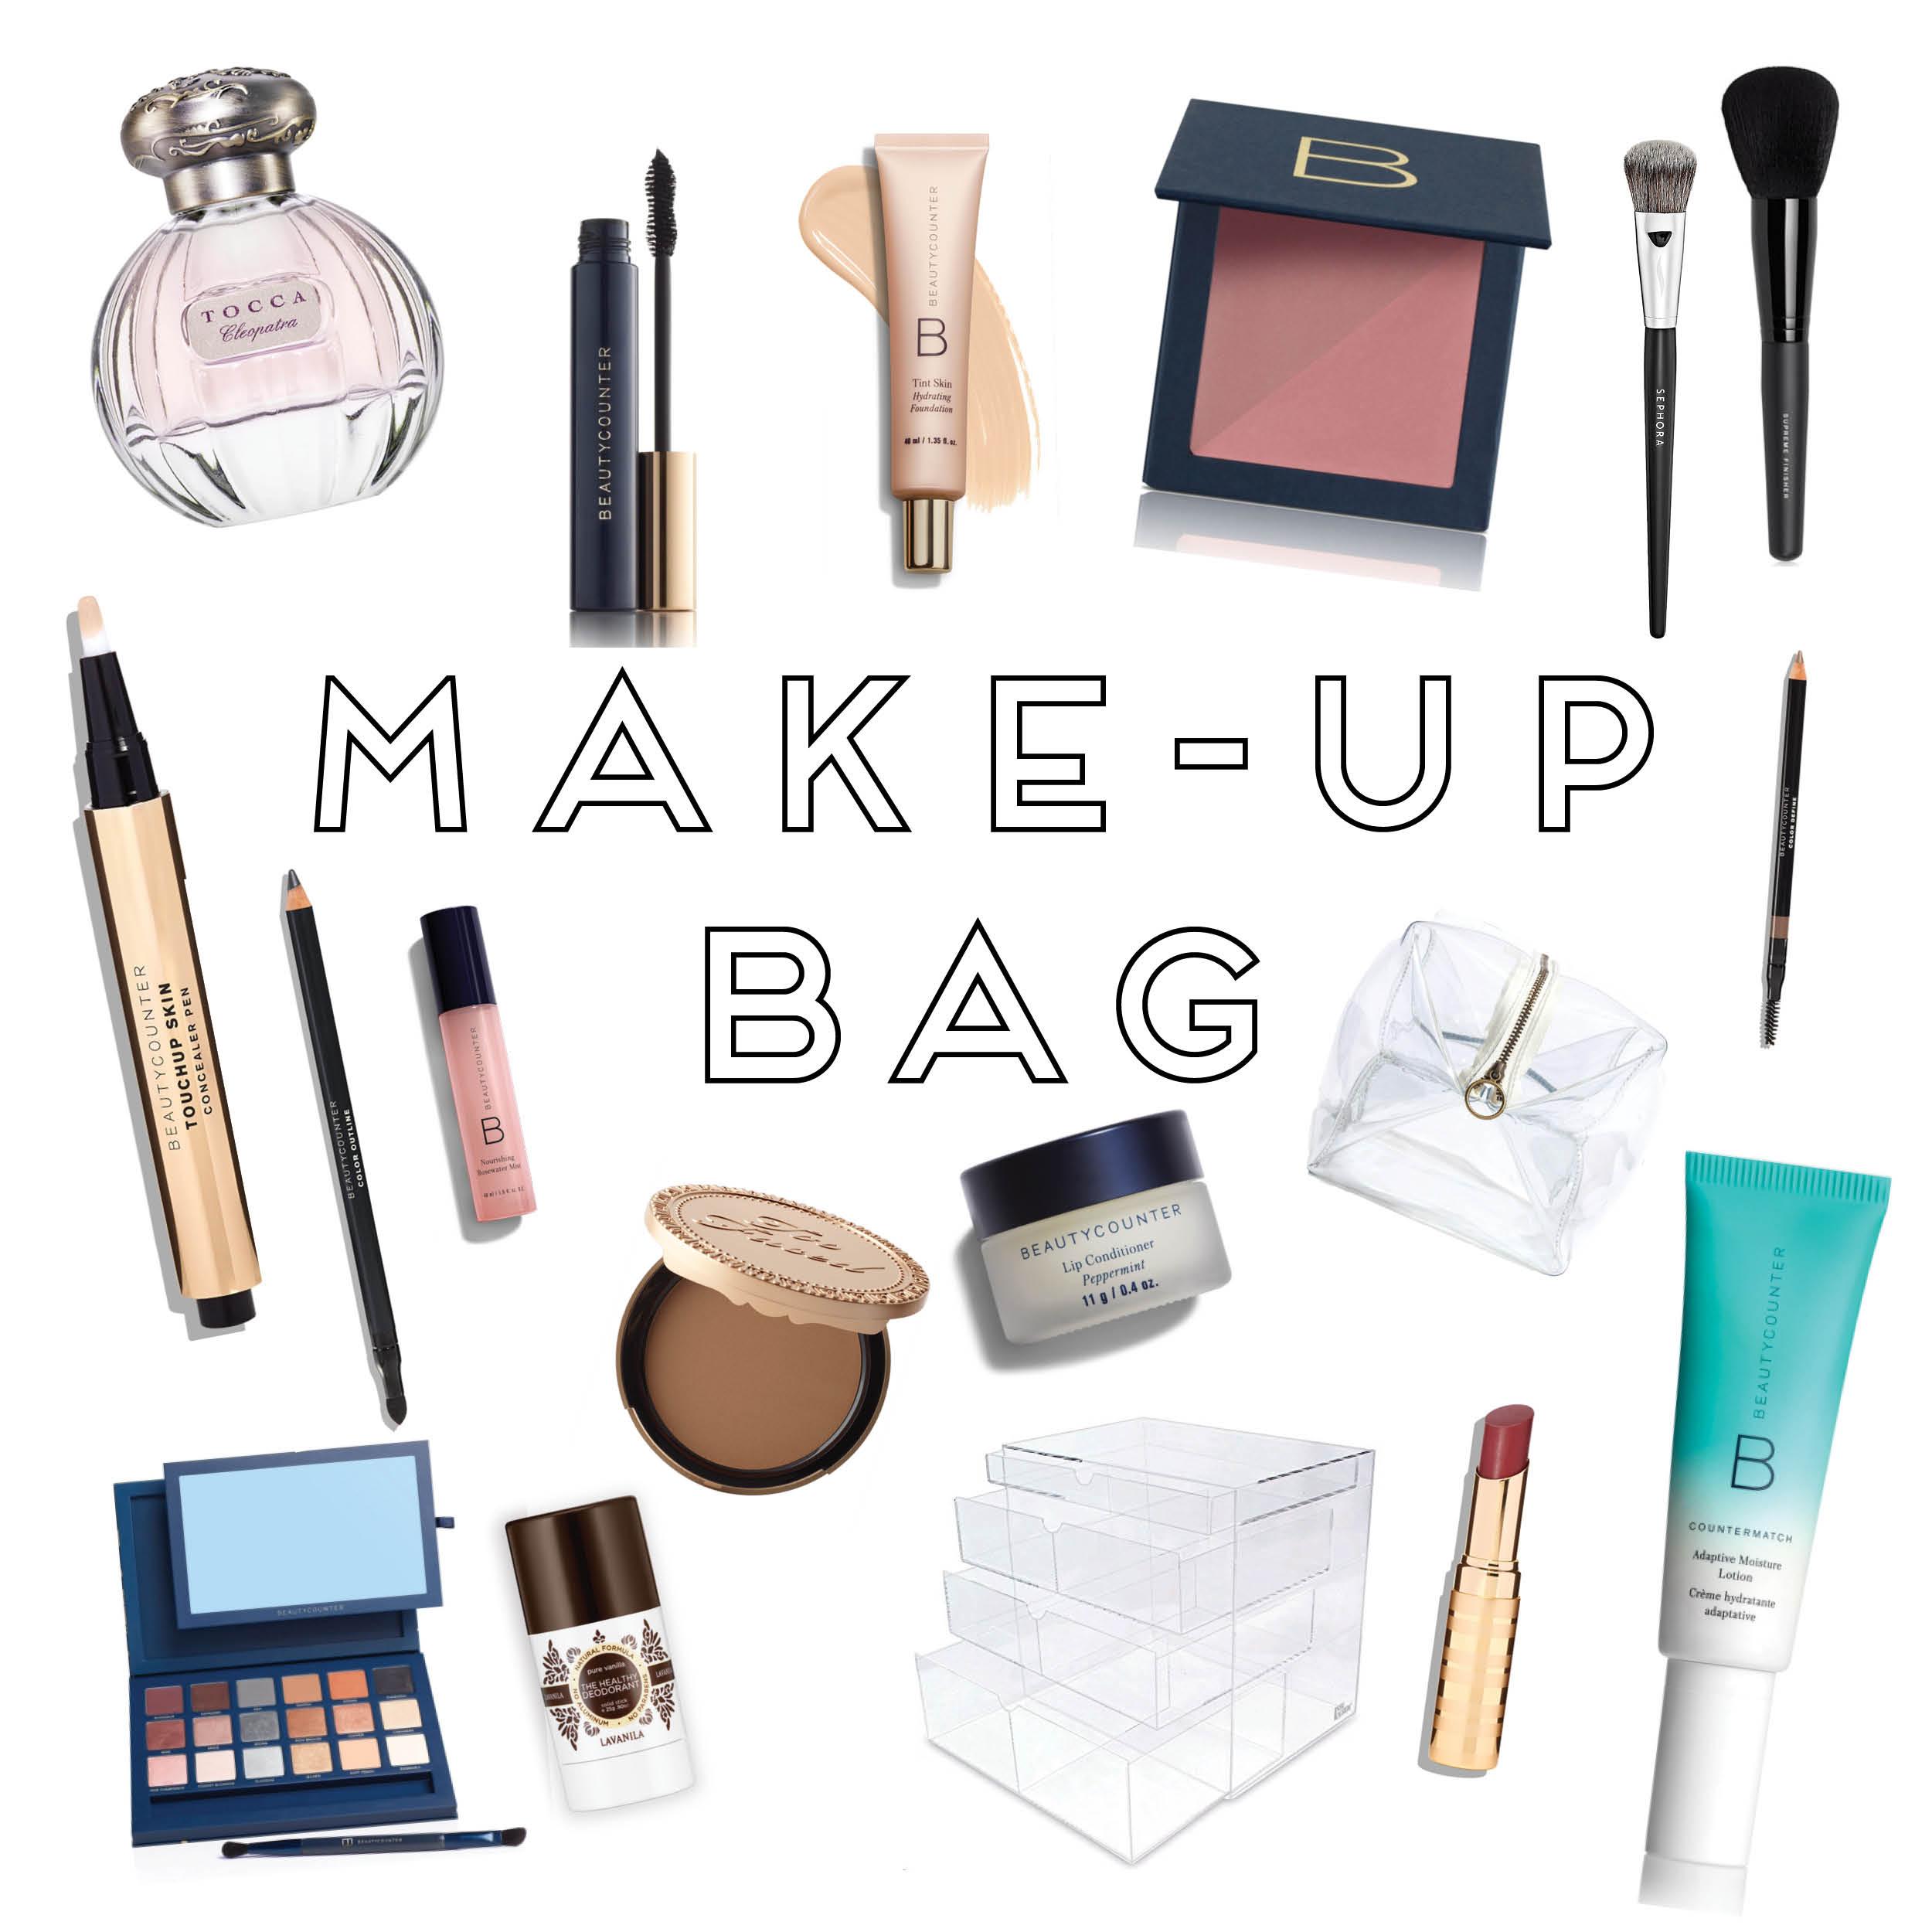 Make-up Bag Flat Lay FINAL.jpg